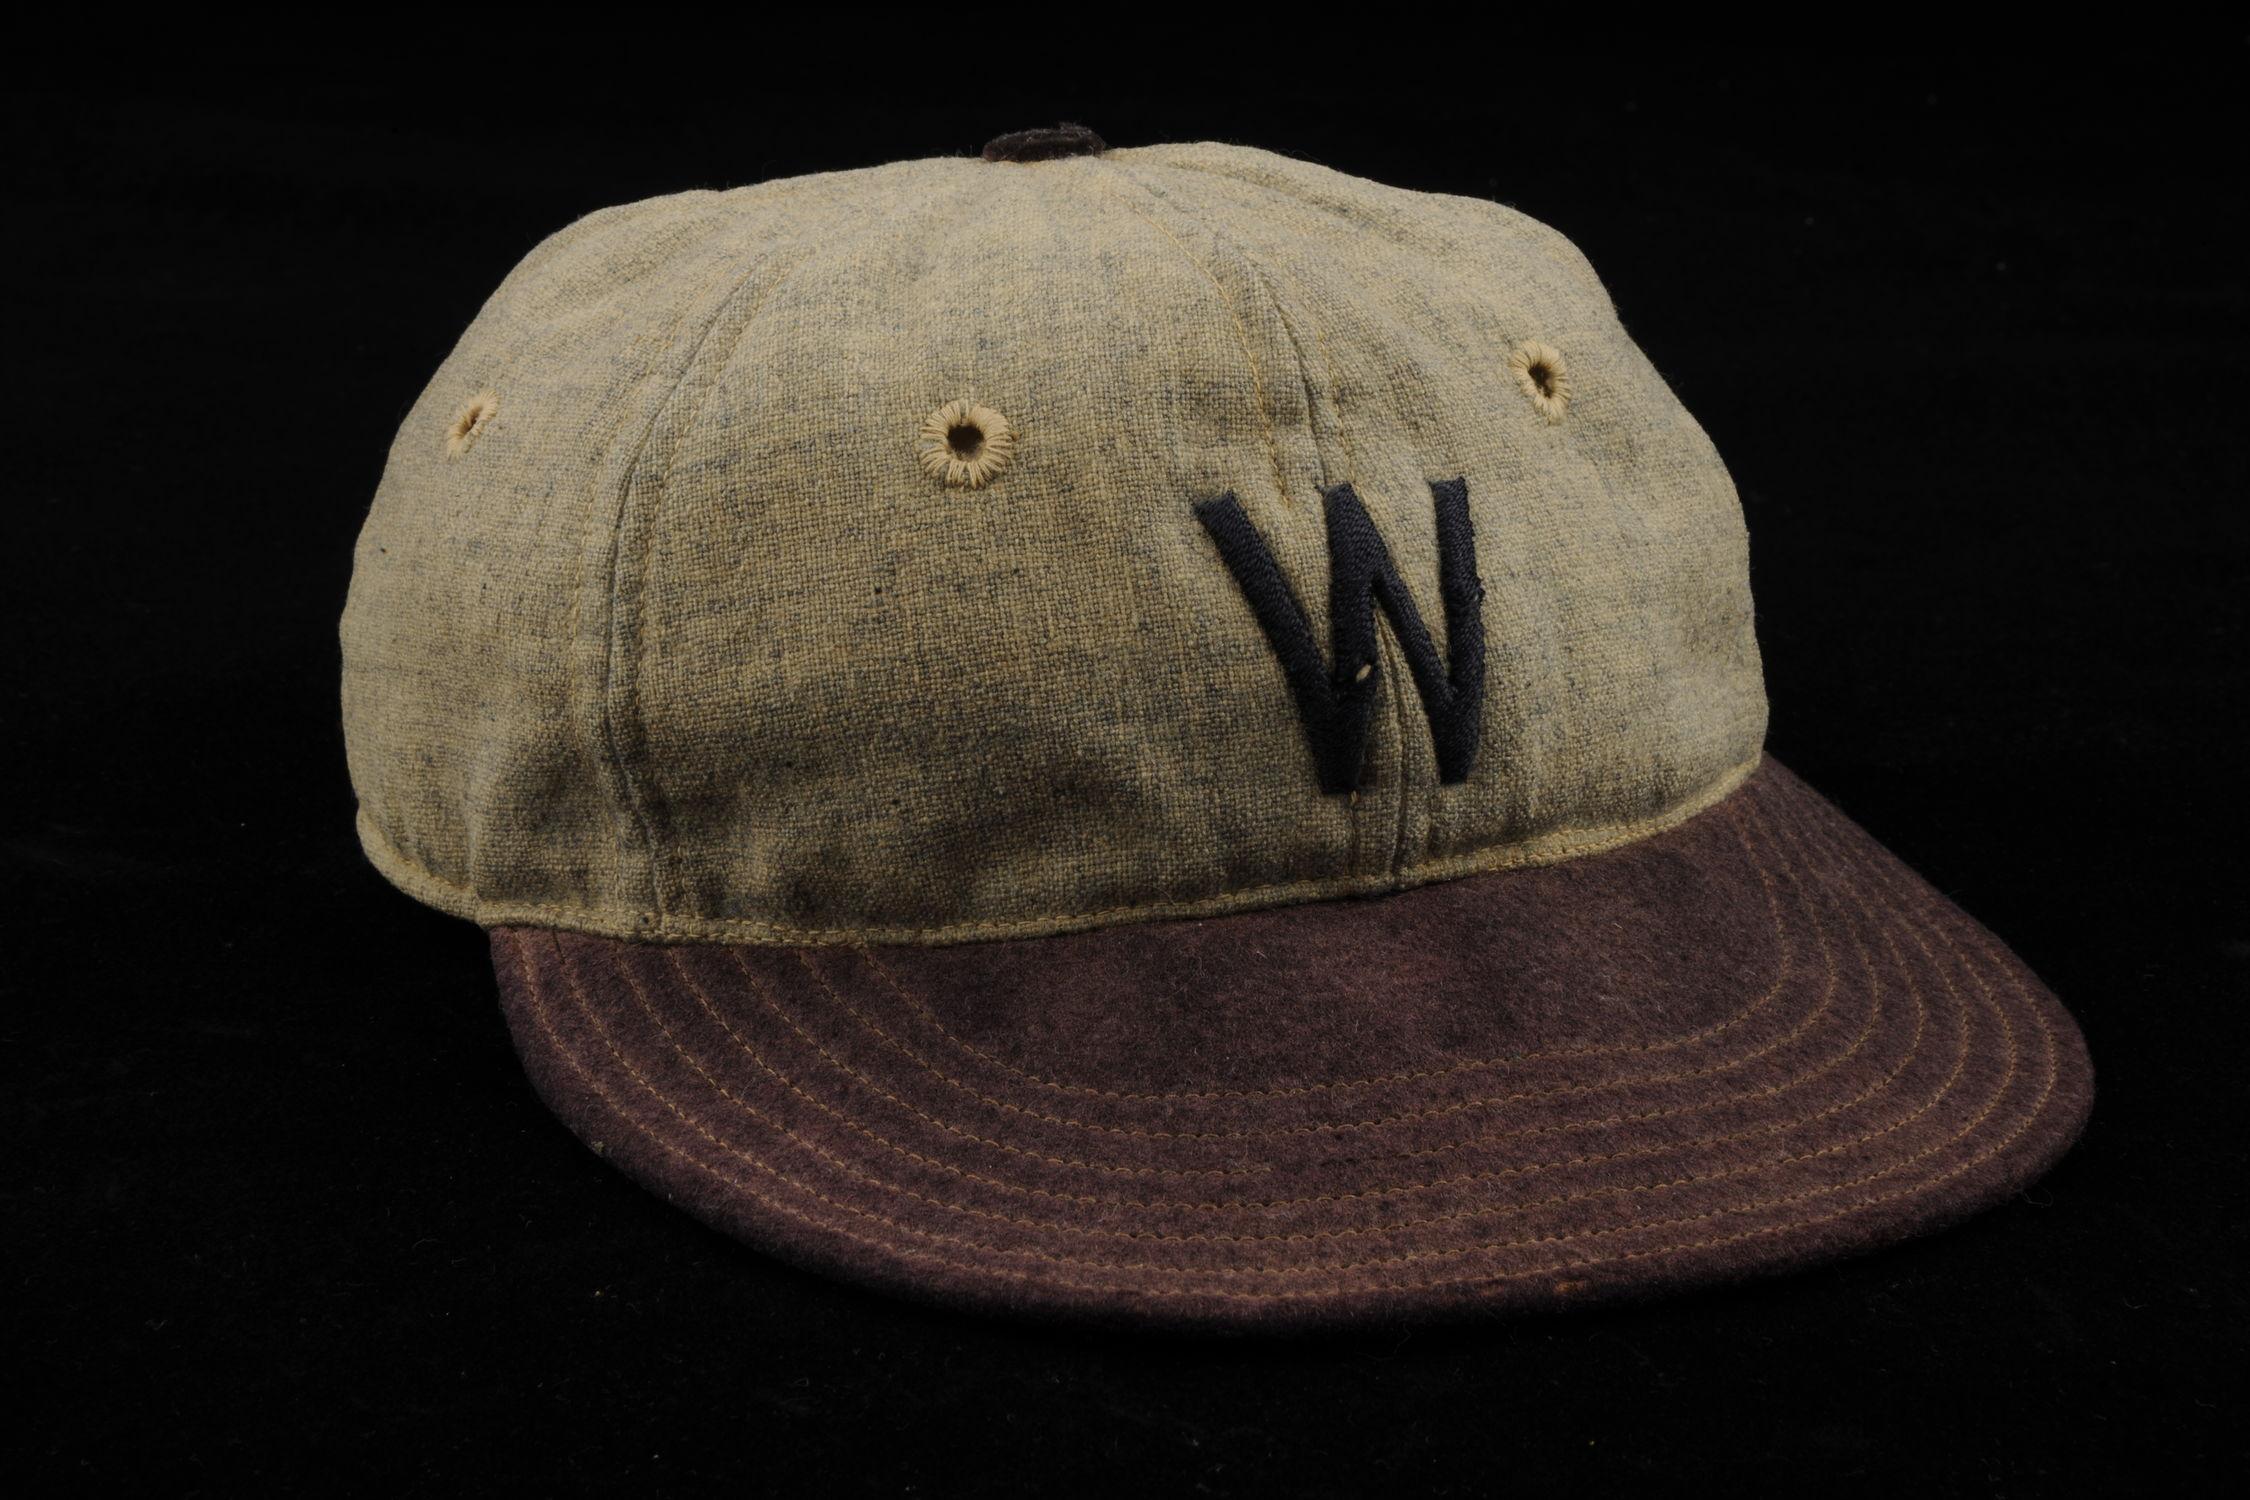 4ba431bdc3d8c Cap worn by Walter Johnson of the Washington Senators - B-215-39 (Milo  Stewart Jr./National Baseball Hall of Fame Library)